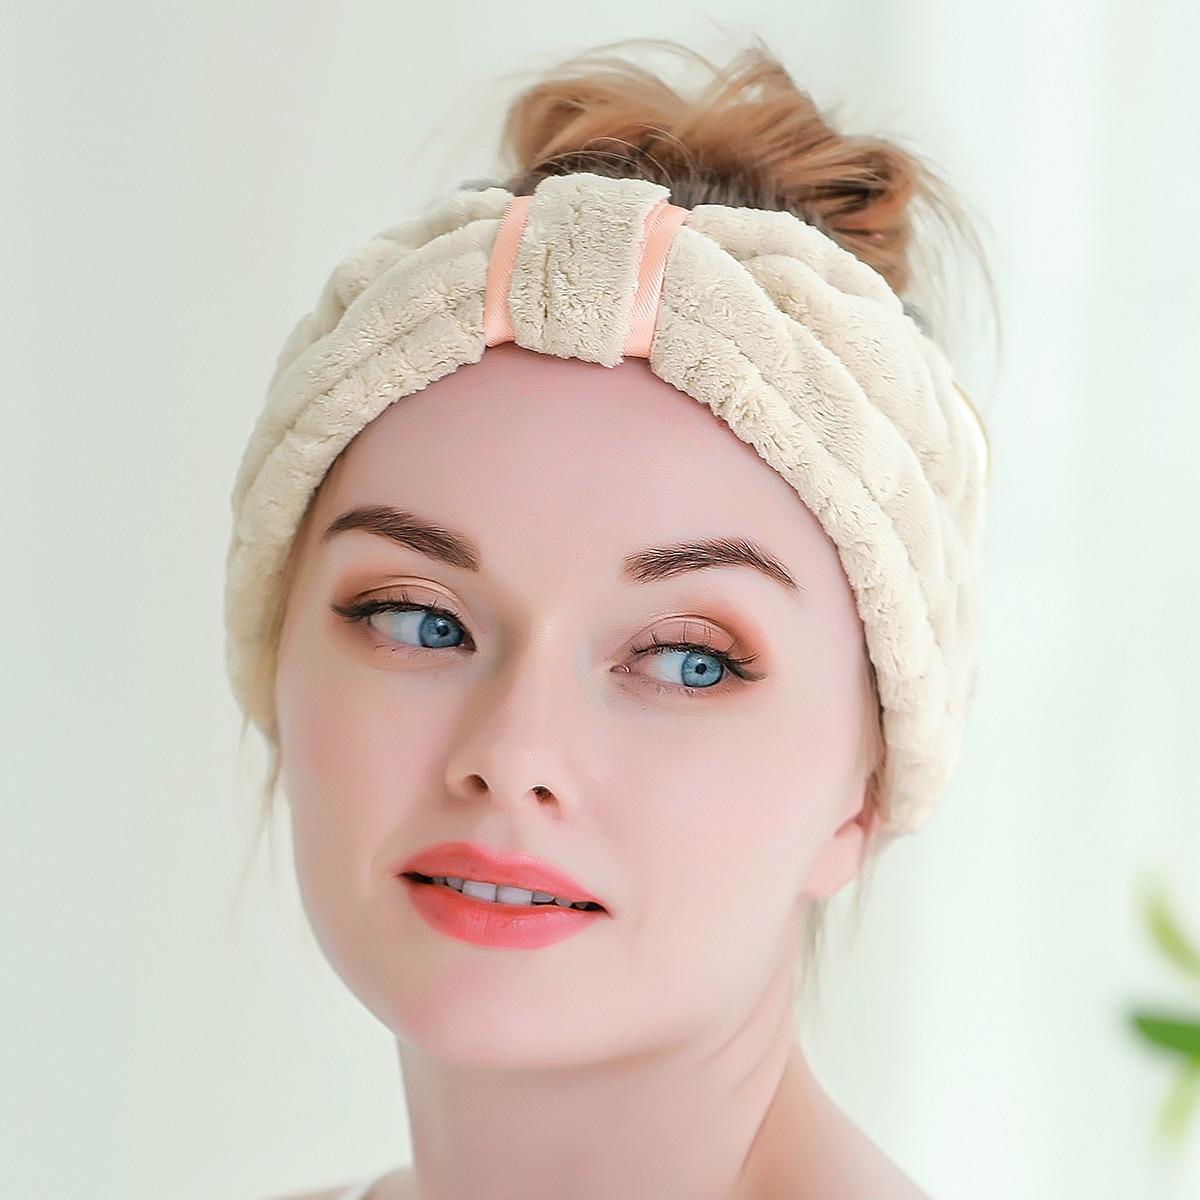 1шт Повязка на голову для ванны